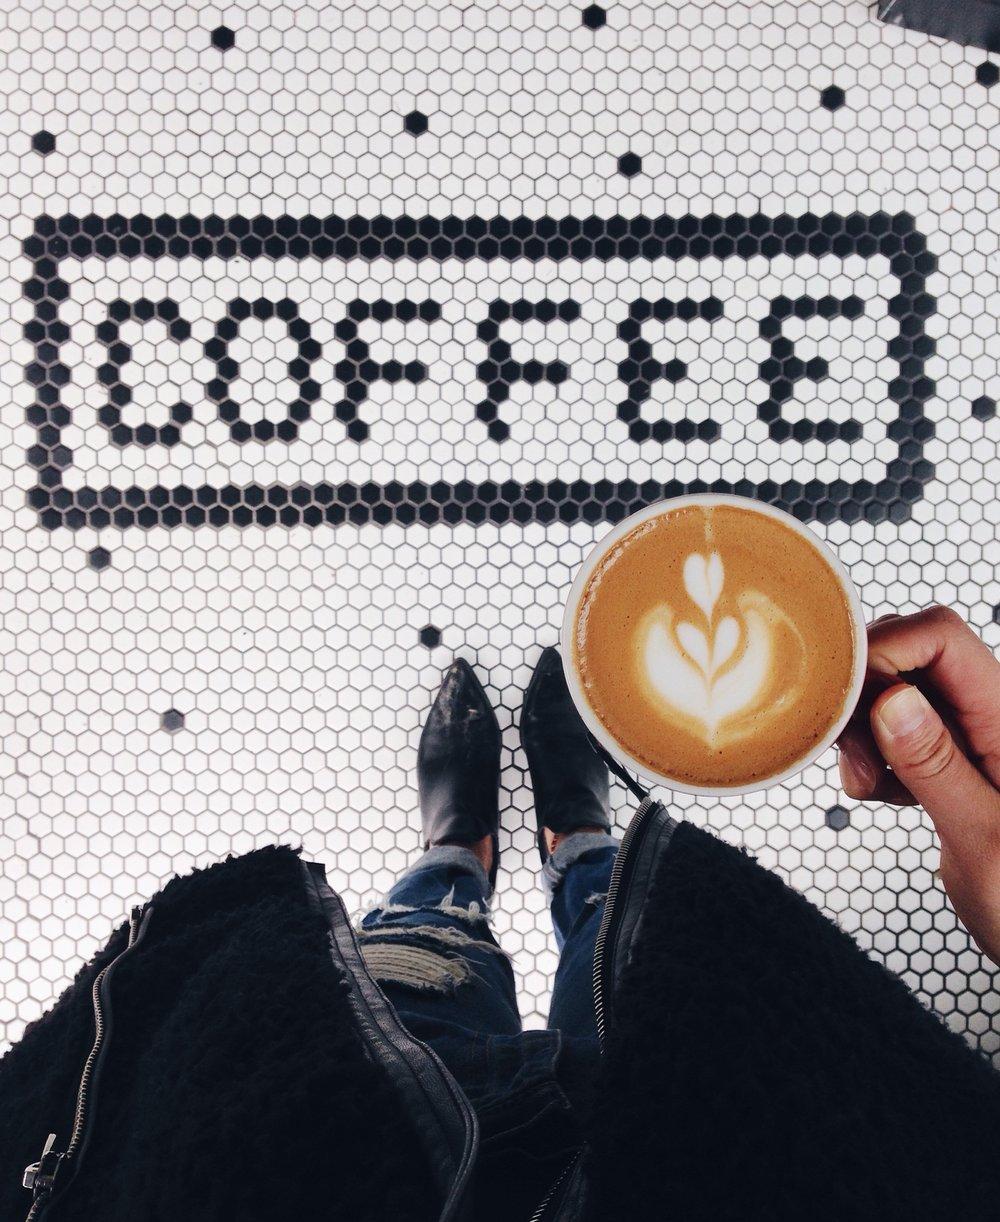 Coffee by a social media photographer